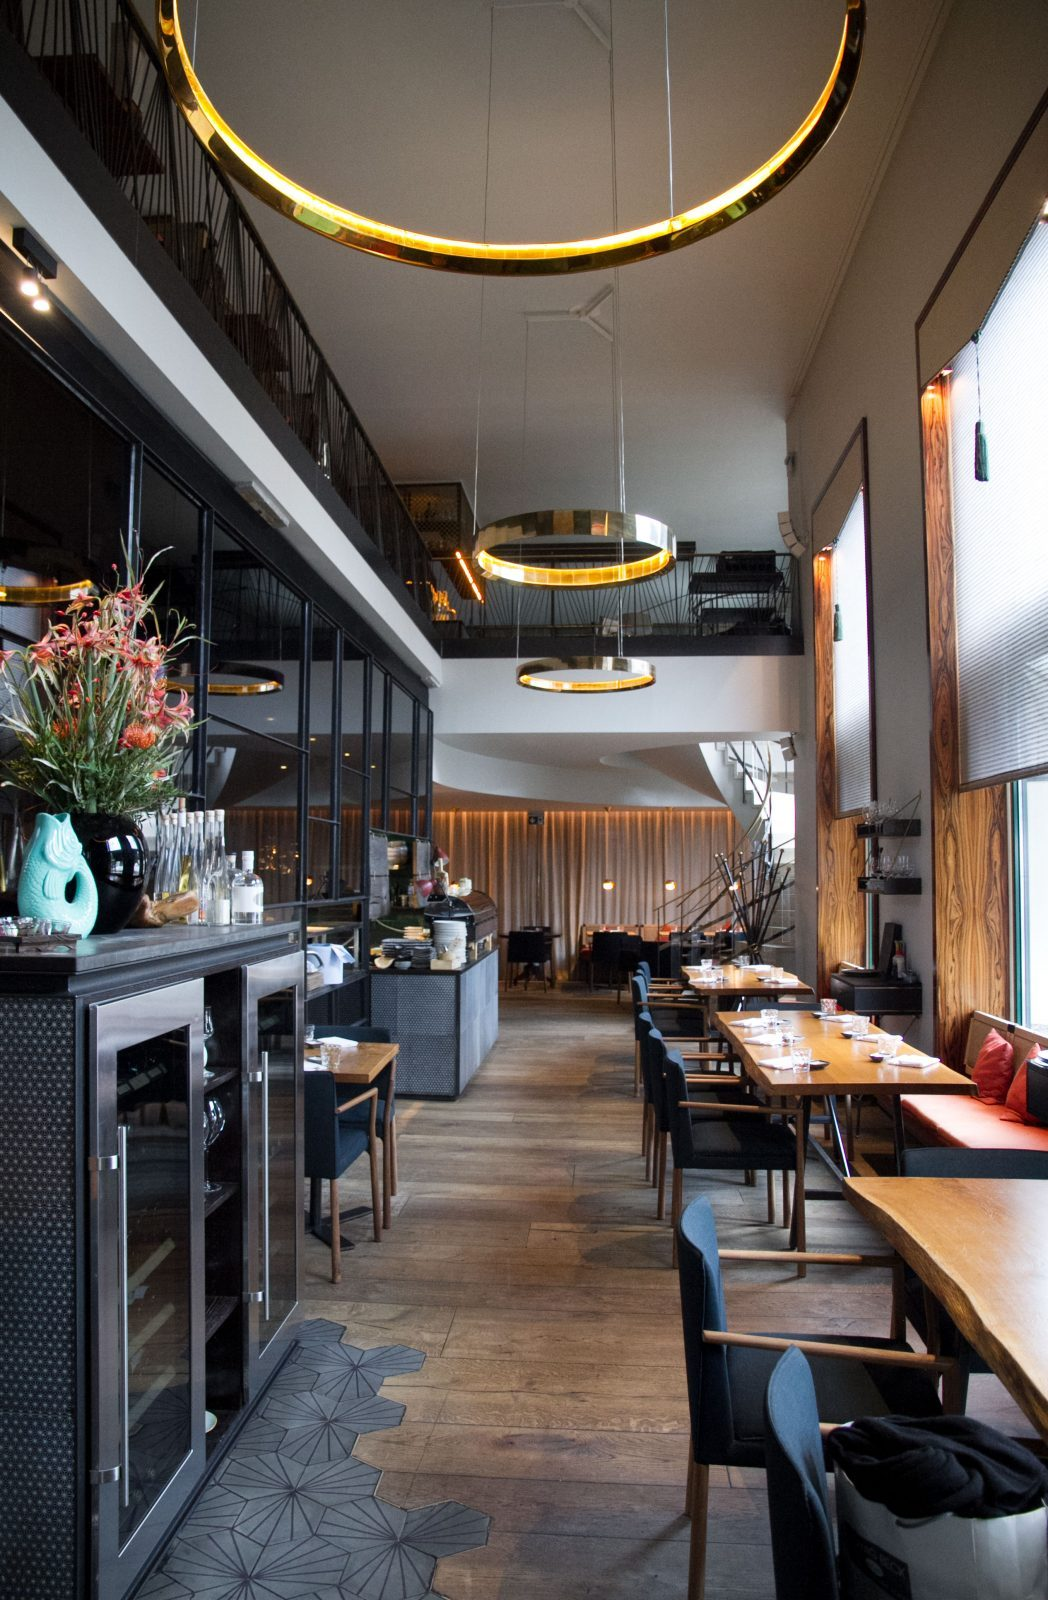 Interior Spots Munich Koi Restaurant on Lifetime-Pieces.com